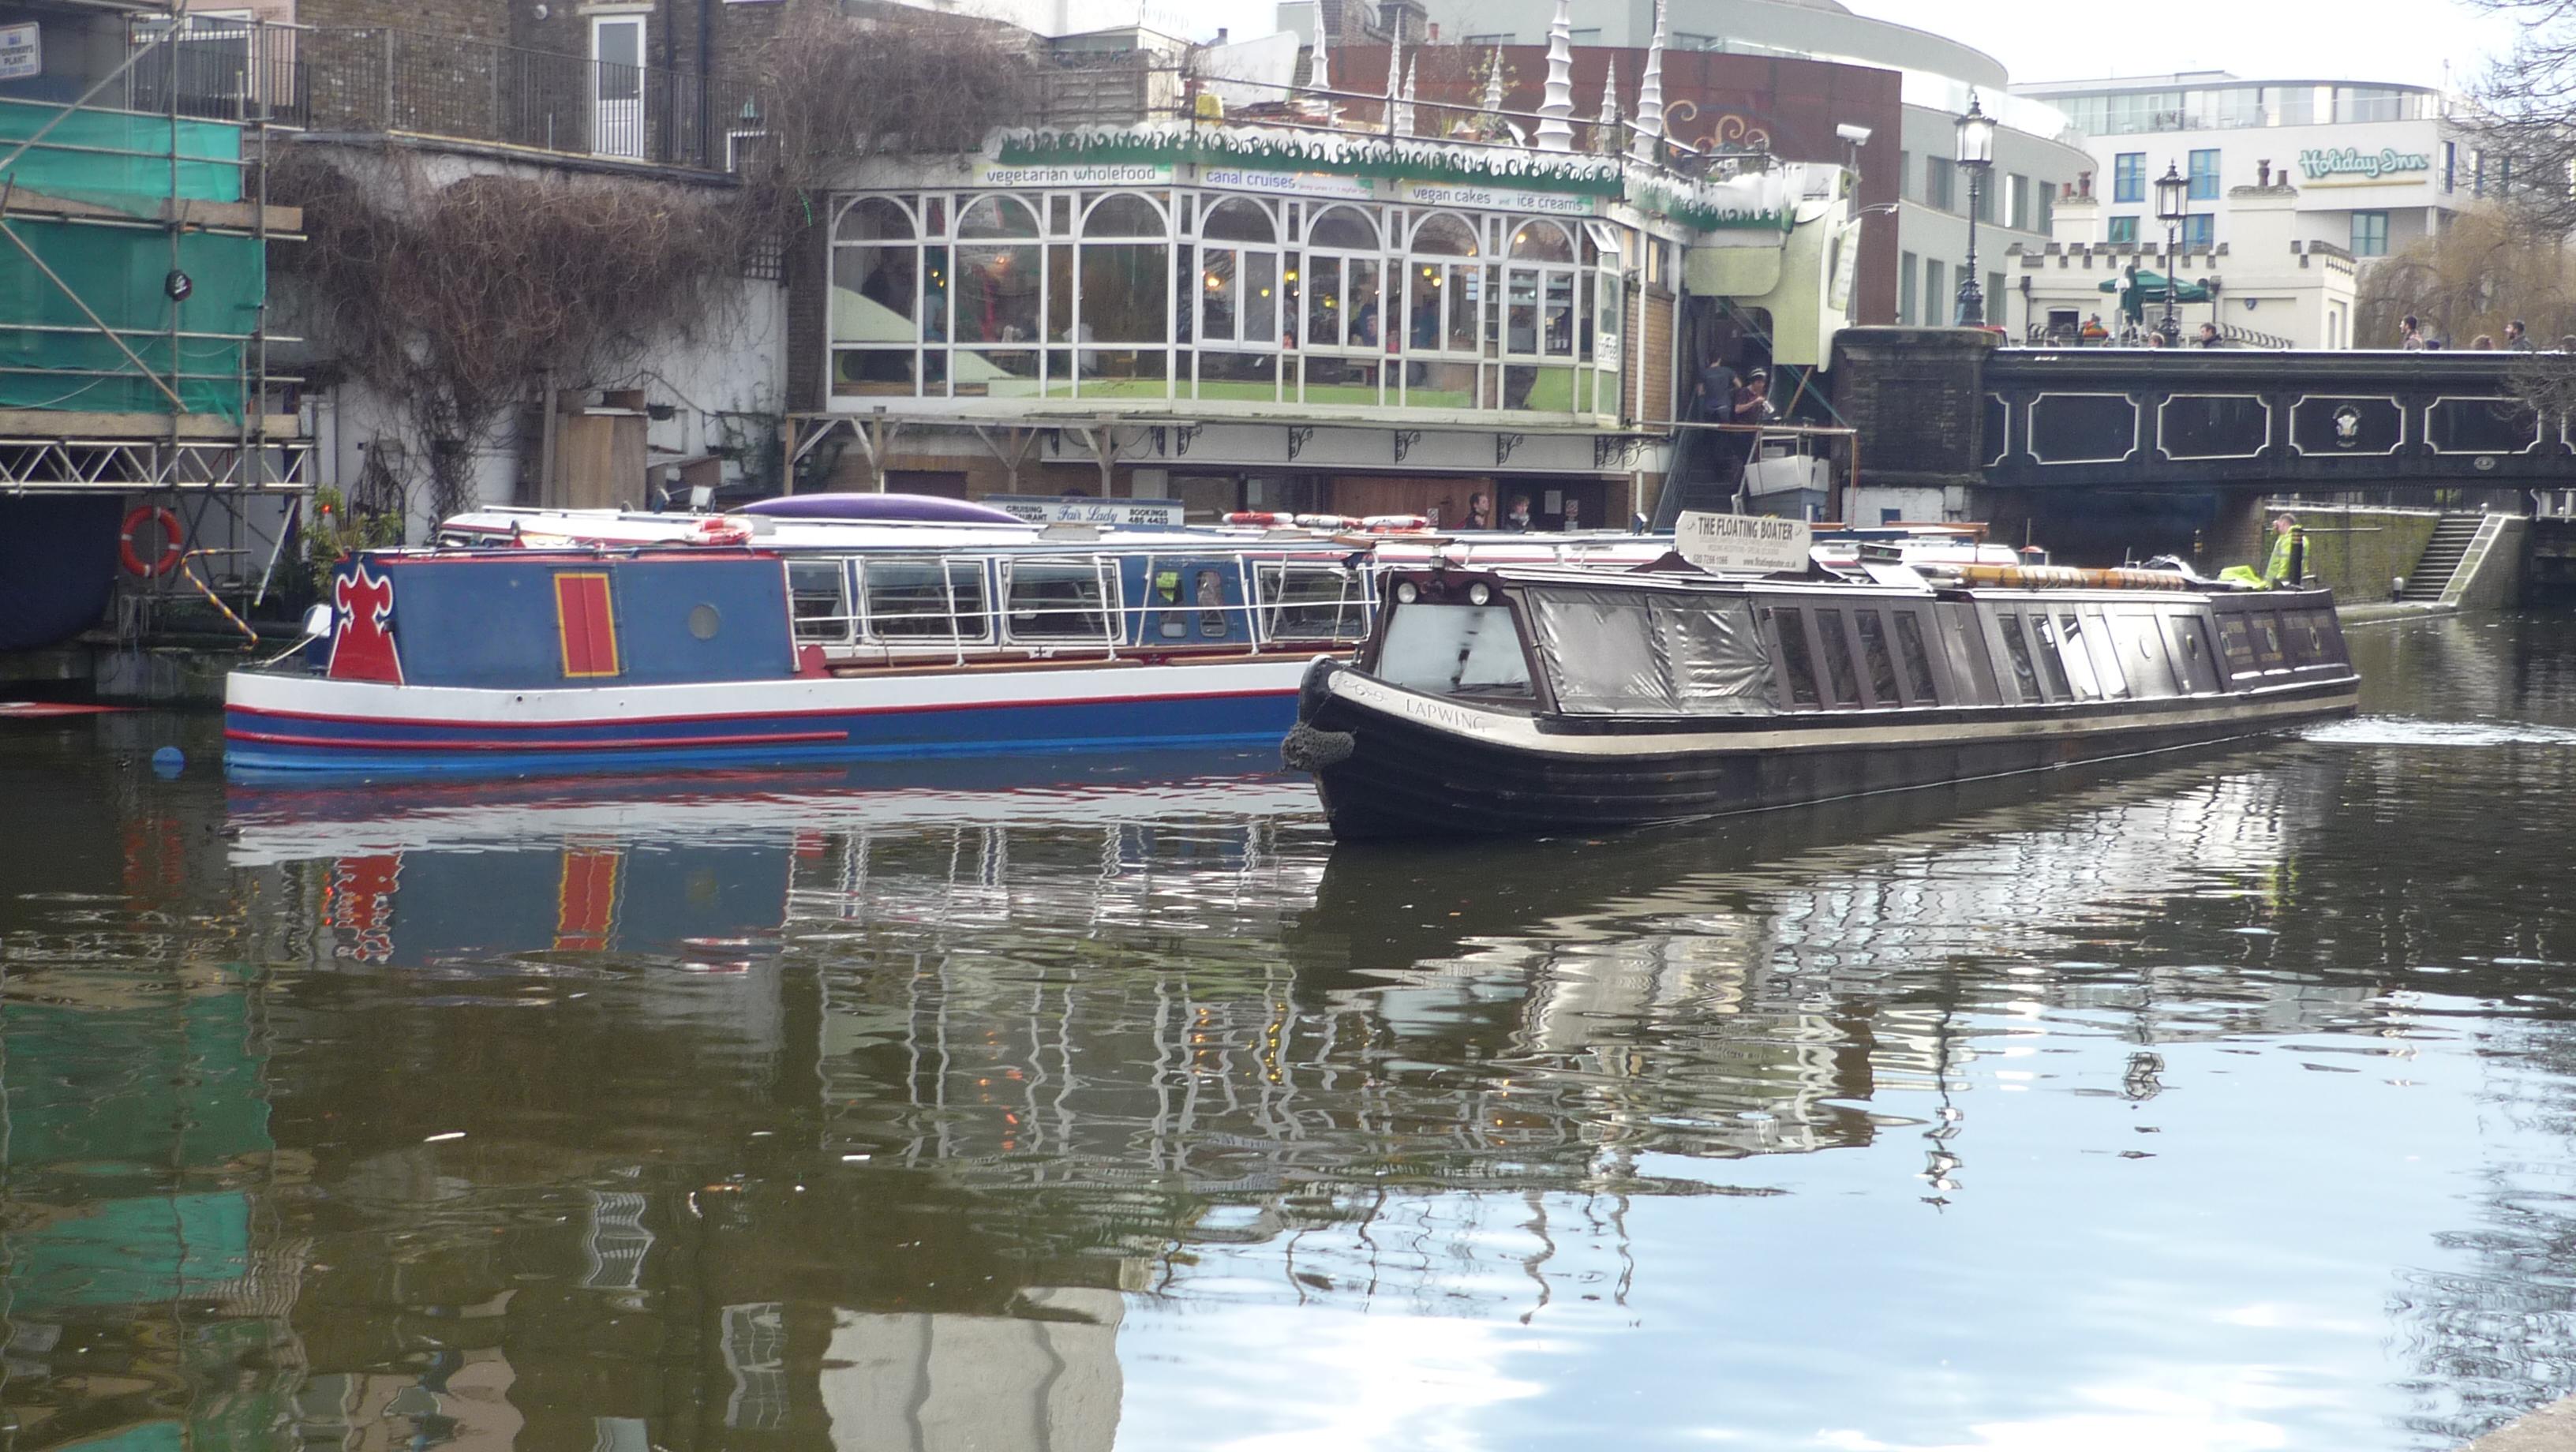 Regent's Canal au niveau de Camden Lock